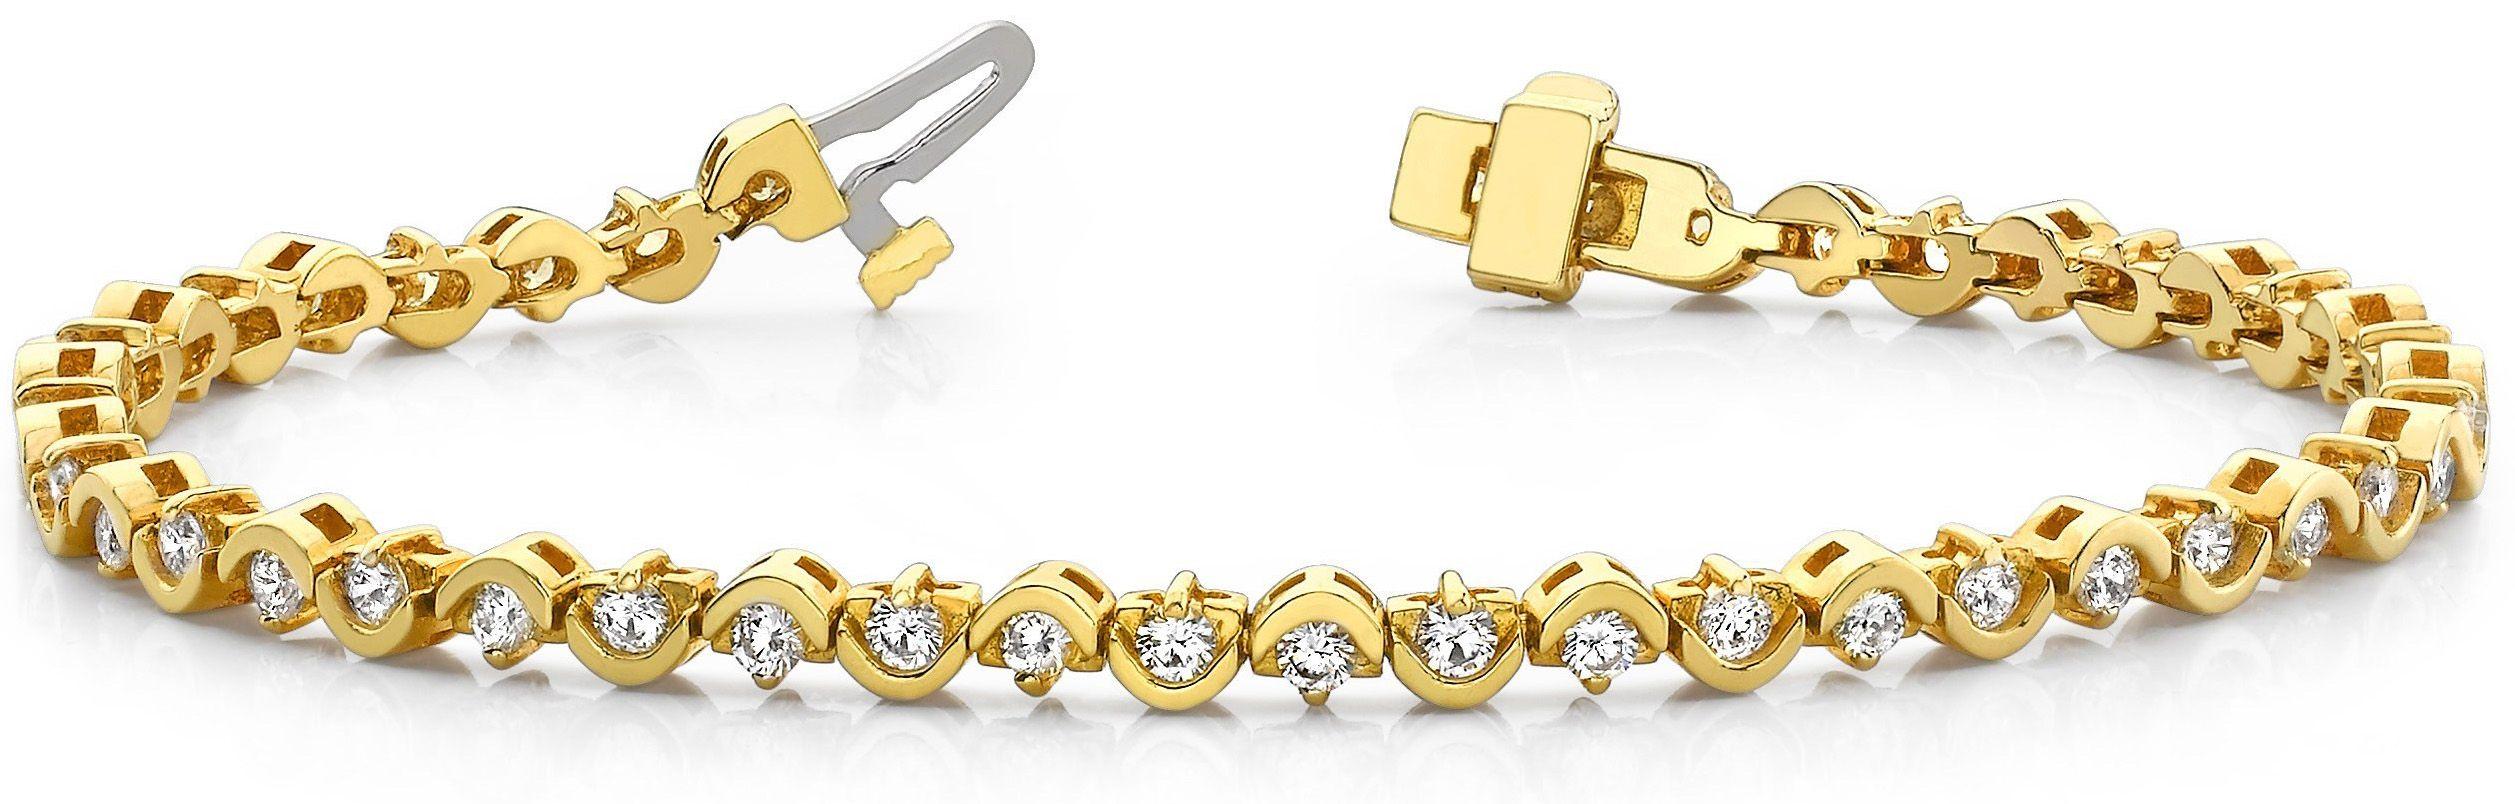 Diamant Armband 2.00 Karat Brillanten 14K 585 Gelbgold in